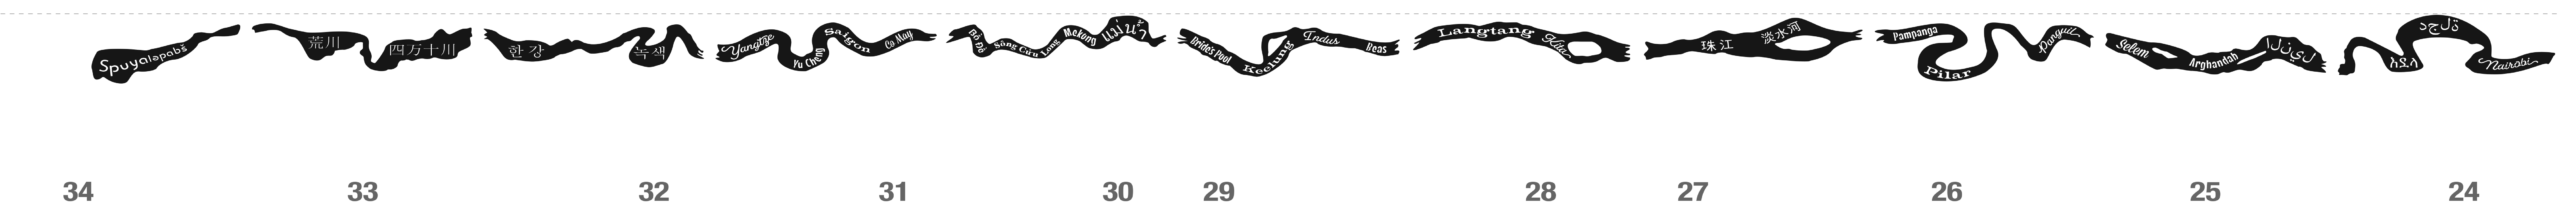 ATR-panel-layouts-2